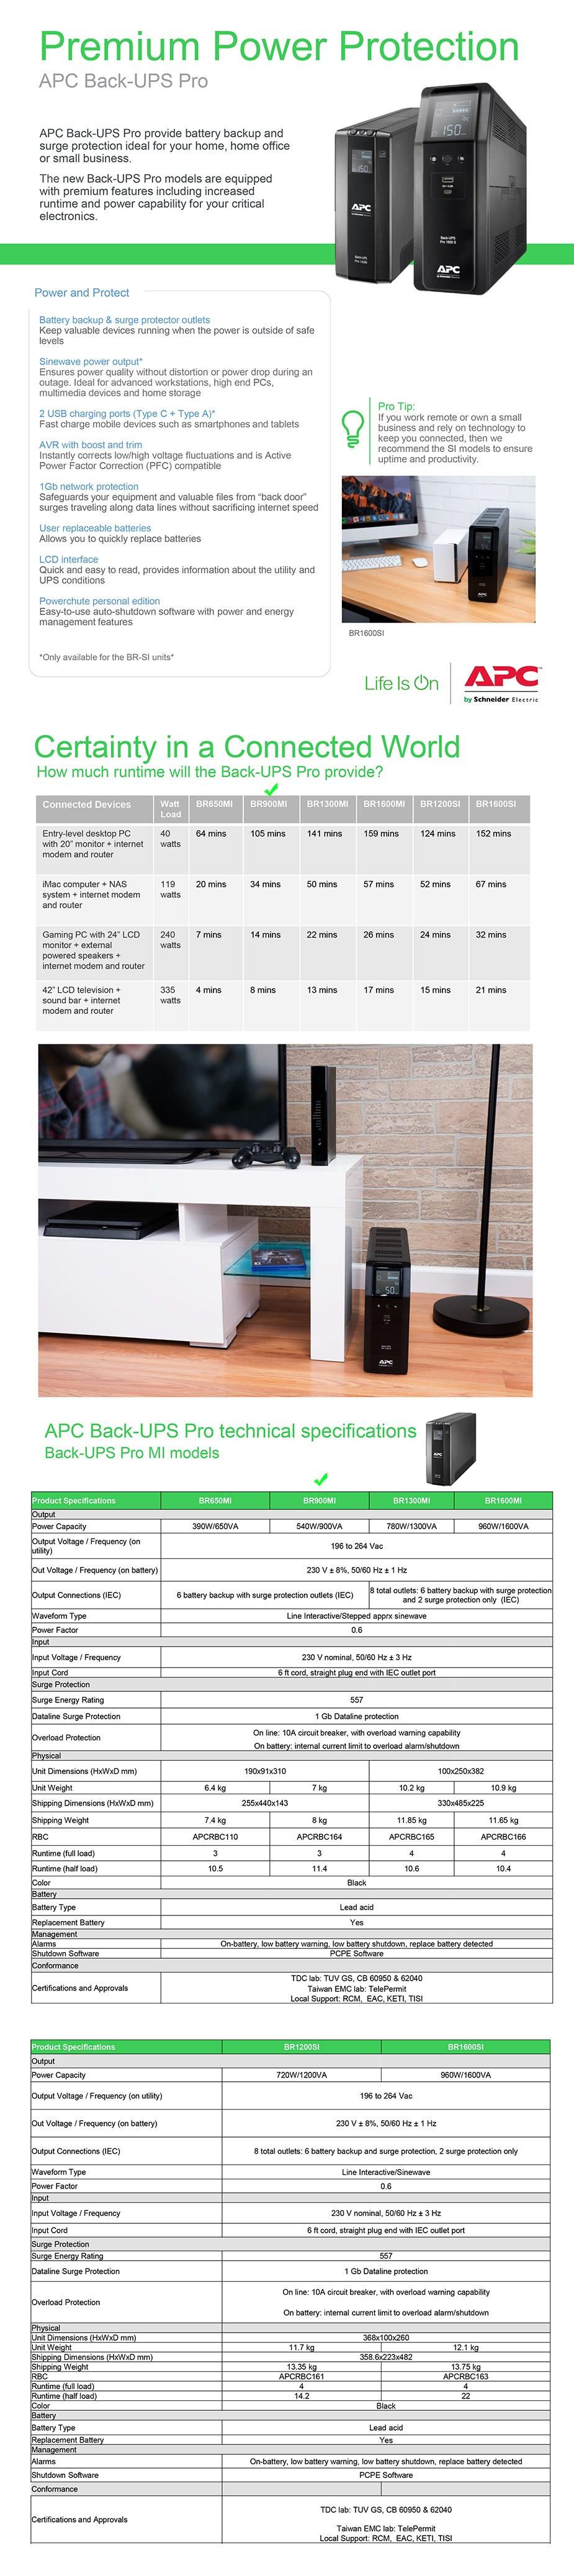 apc-br900mi-back-ups-pro-br-900va540w-line-interactive-ups-ac33519-4.jpg